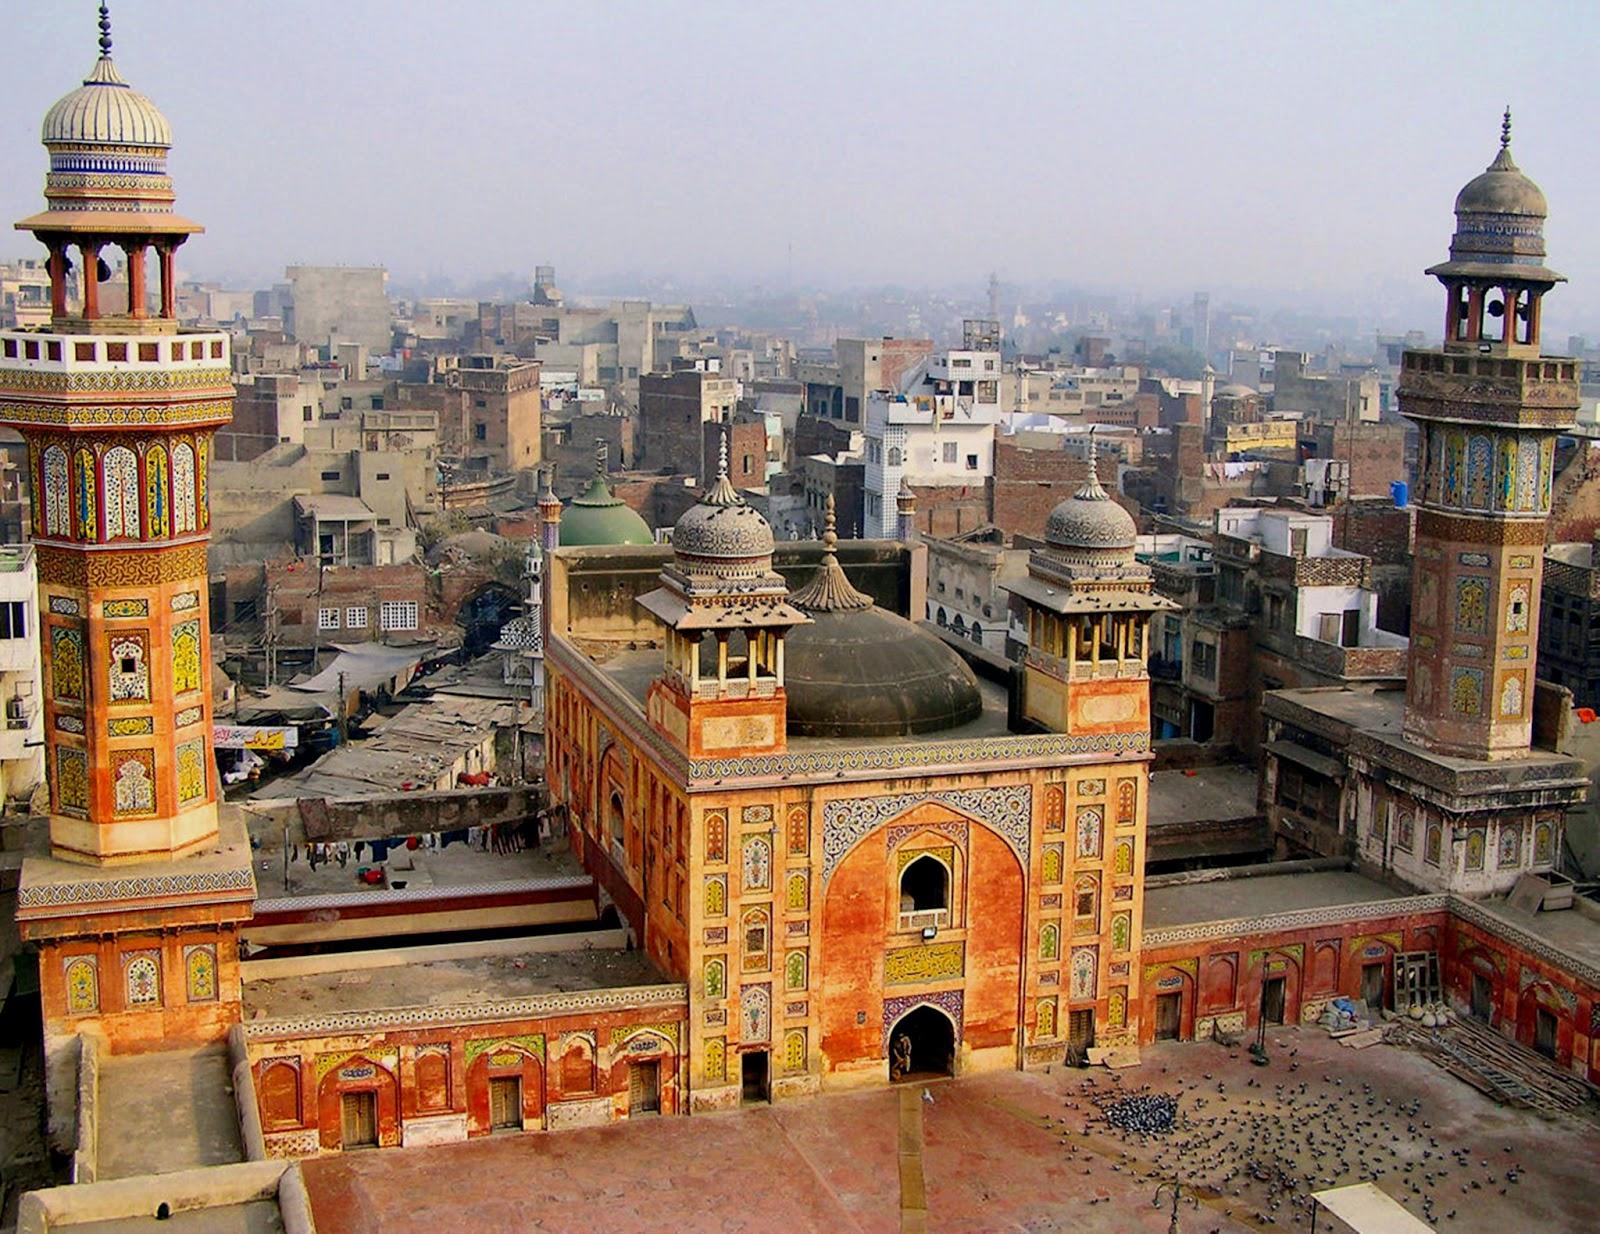 Pakistan-Lahorejpg